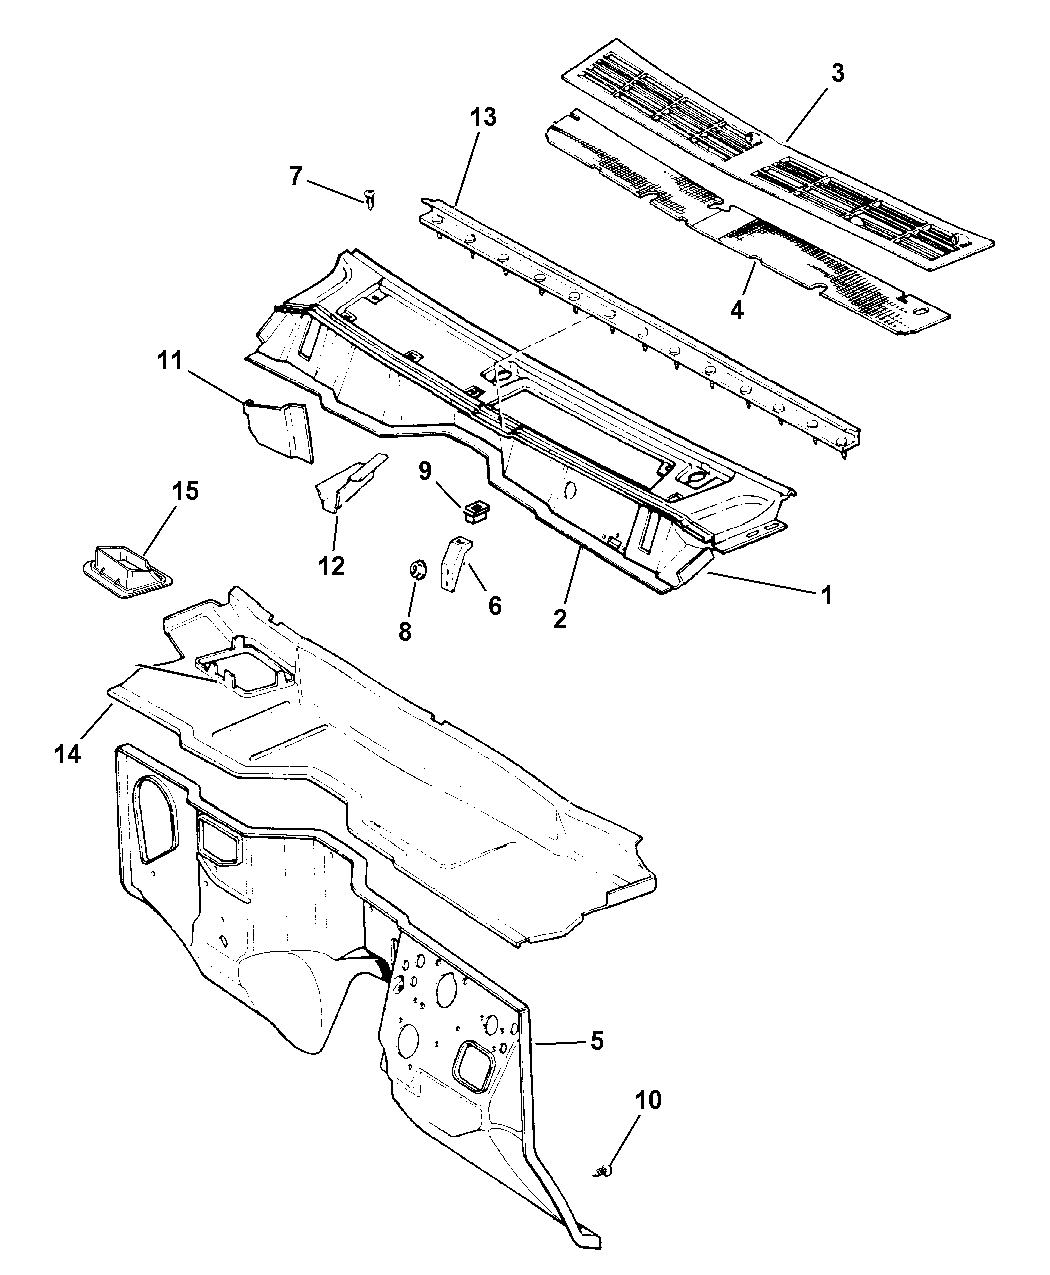 Wiring Diagram: 32 2001 Jeep Grand Cherokee Parts Diagram